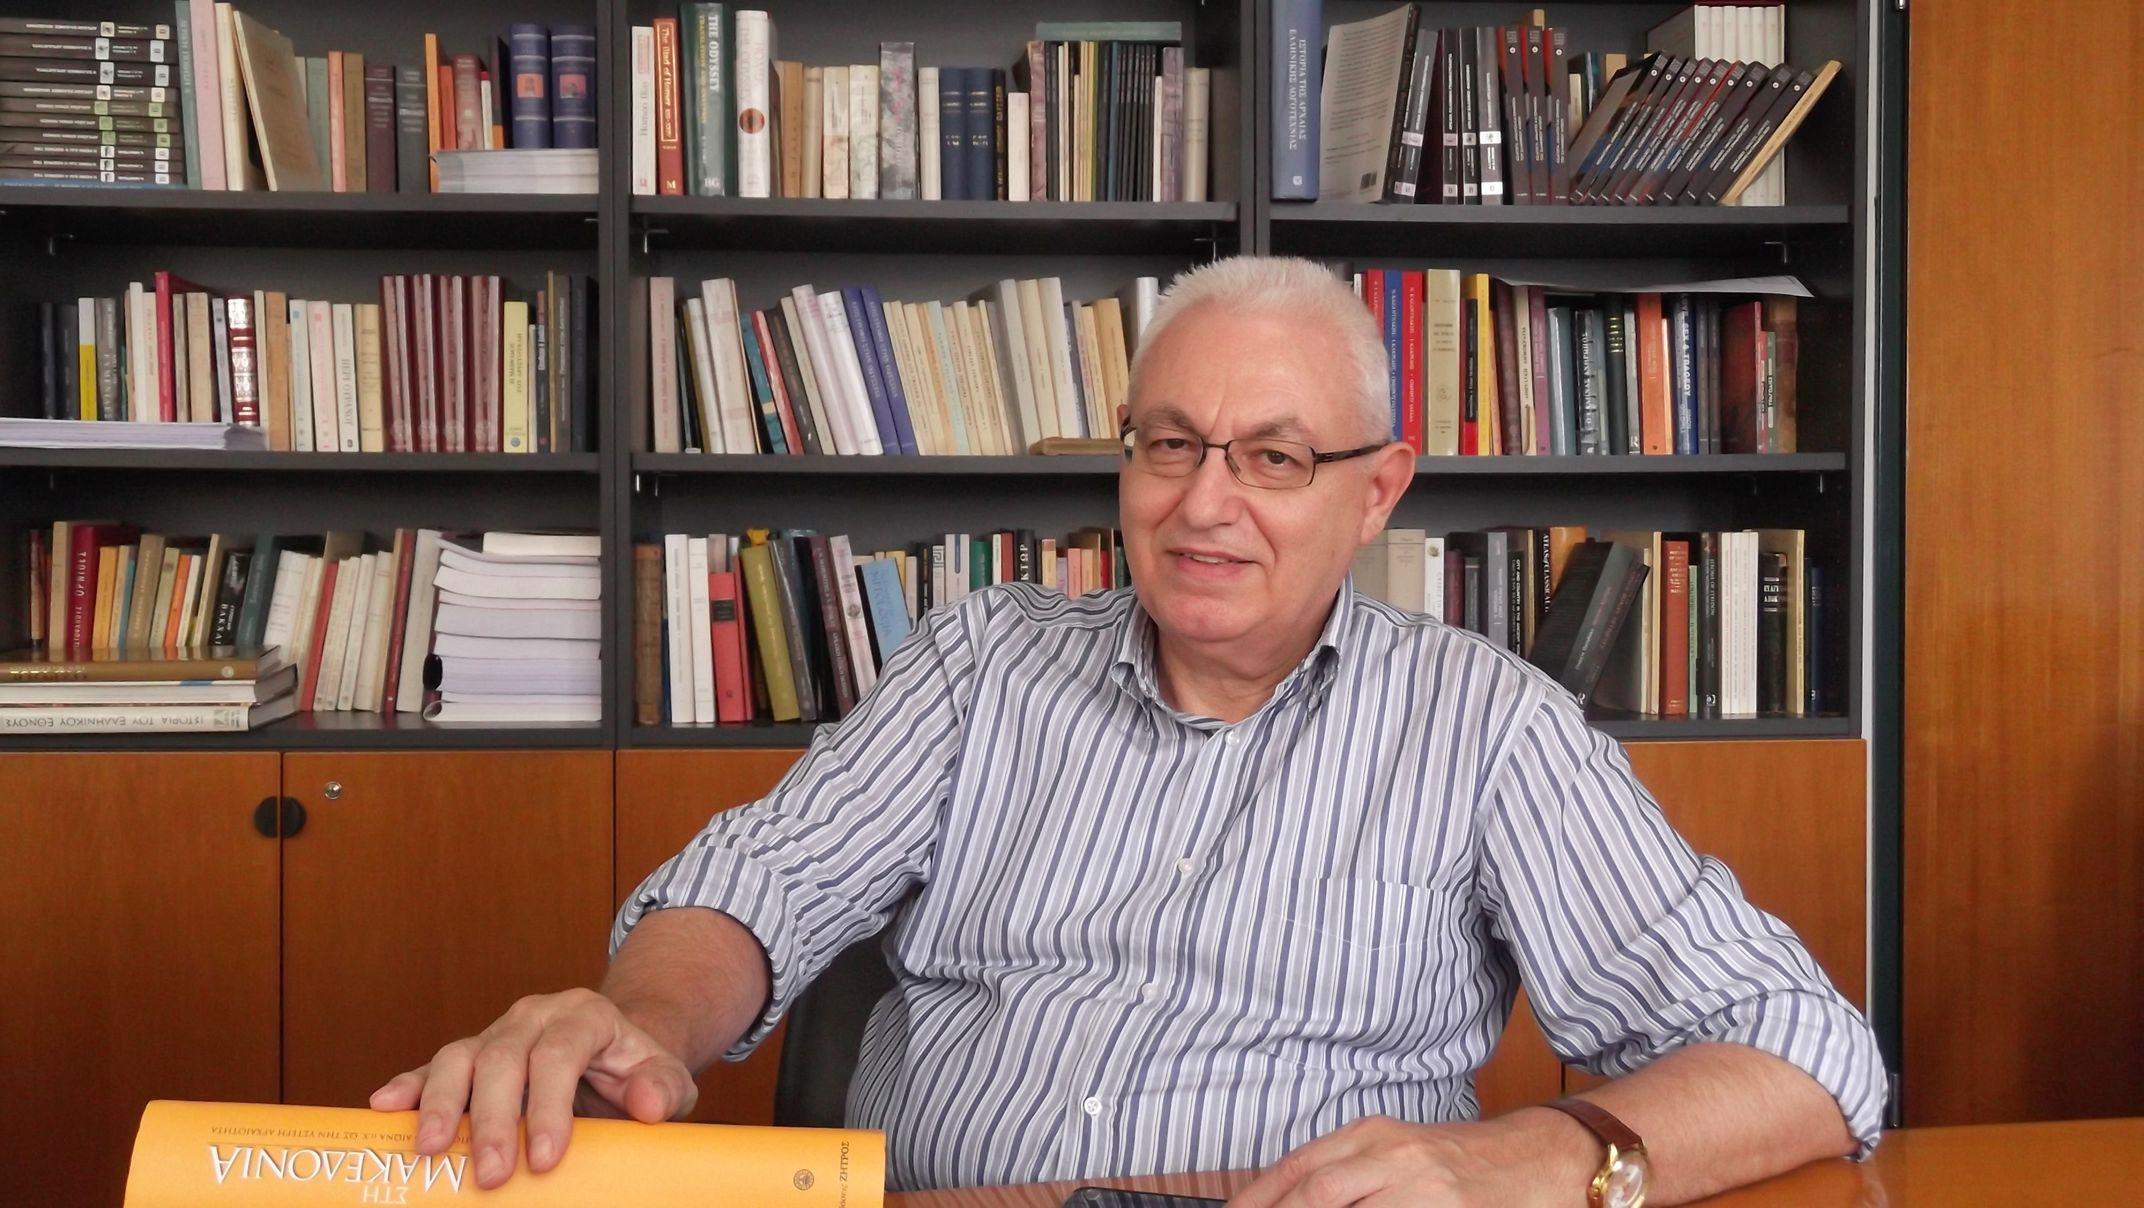 John Kazazis